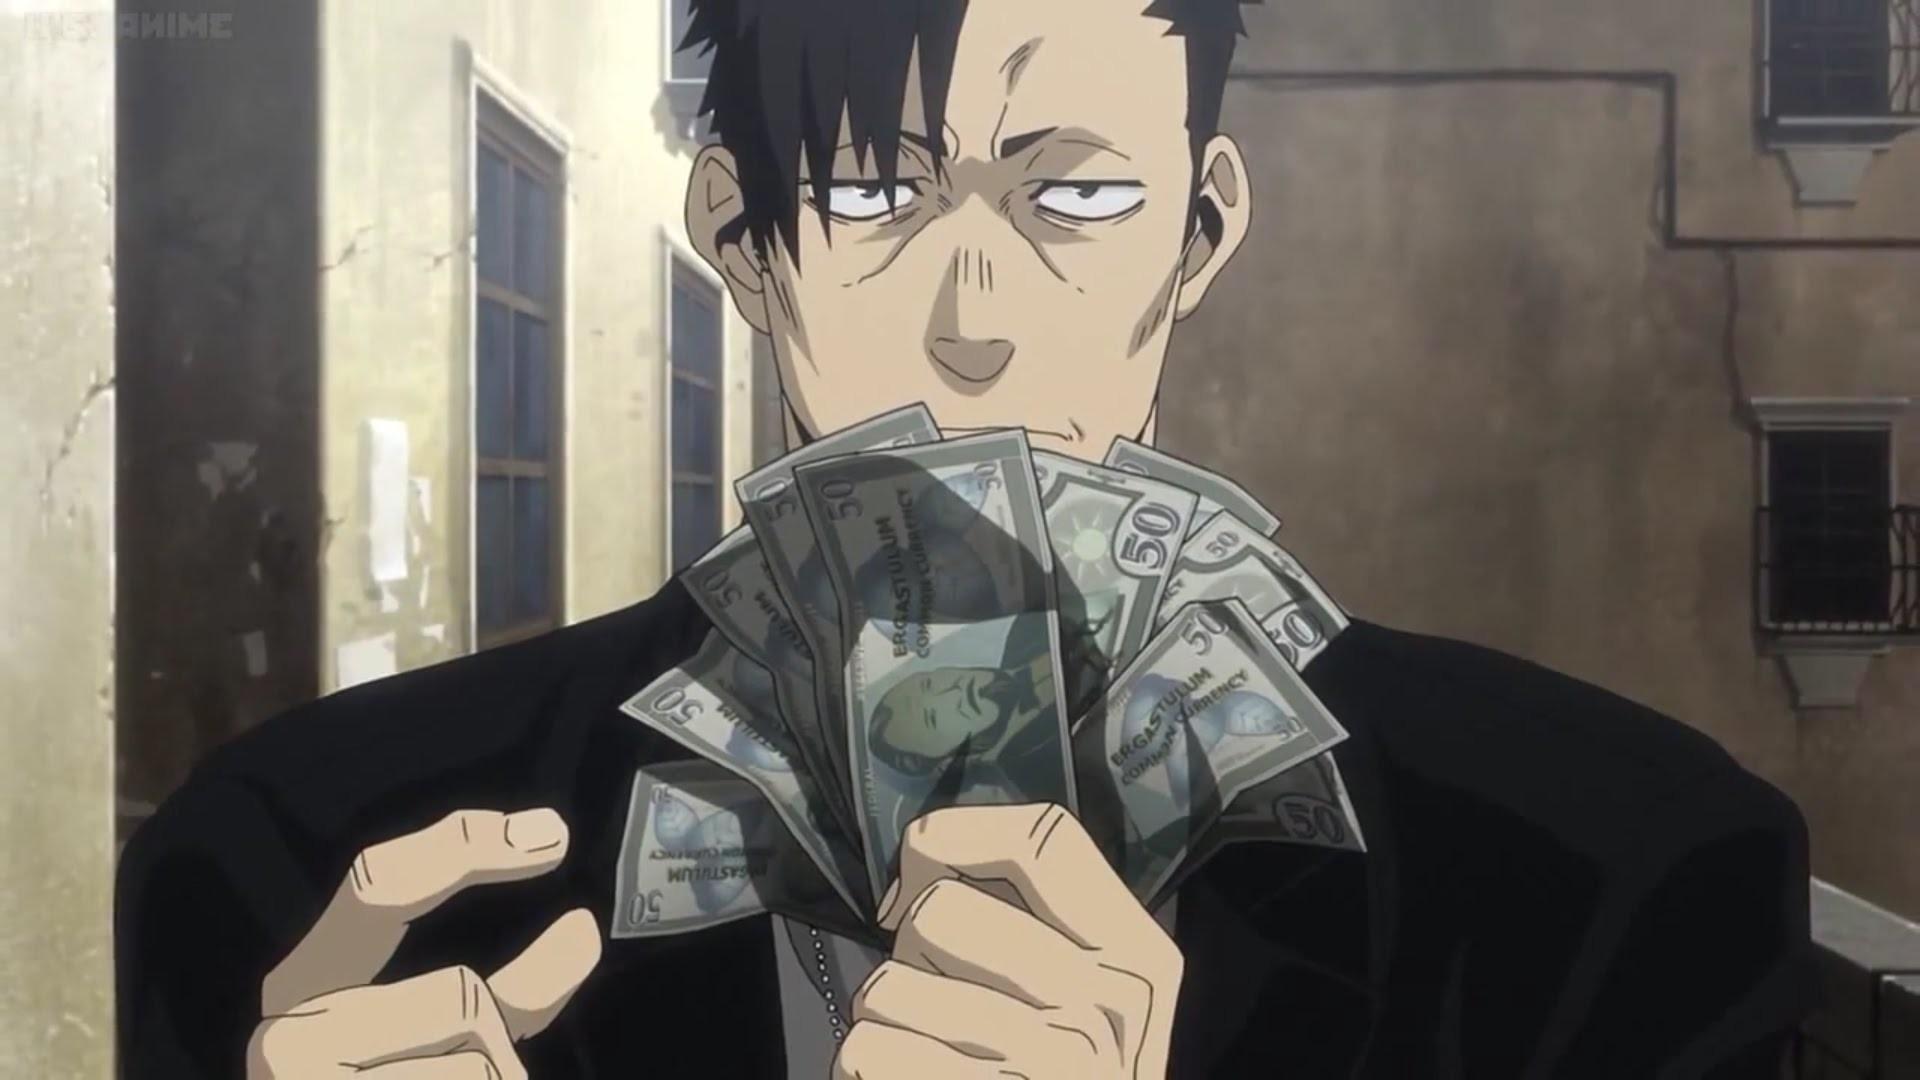 gangsta anime wallpaper hd – Google Search